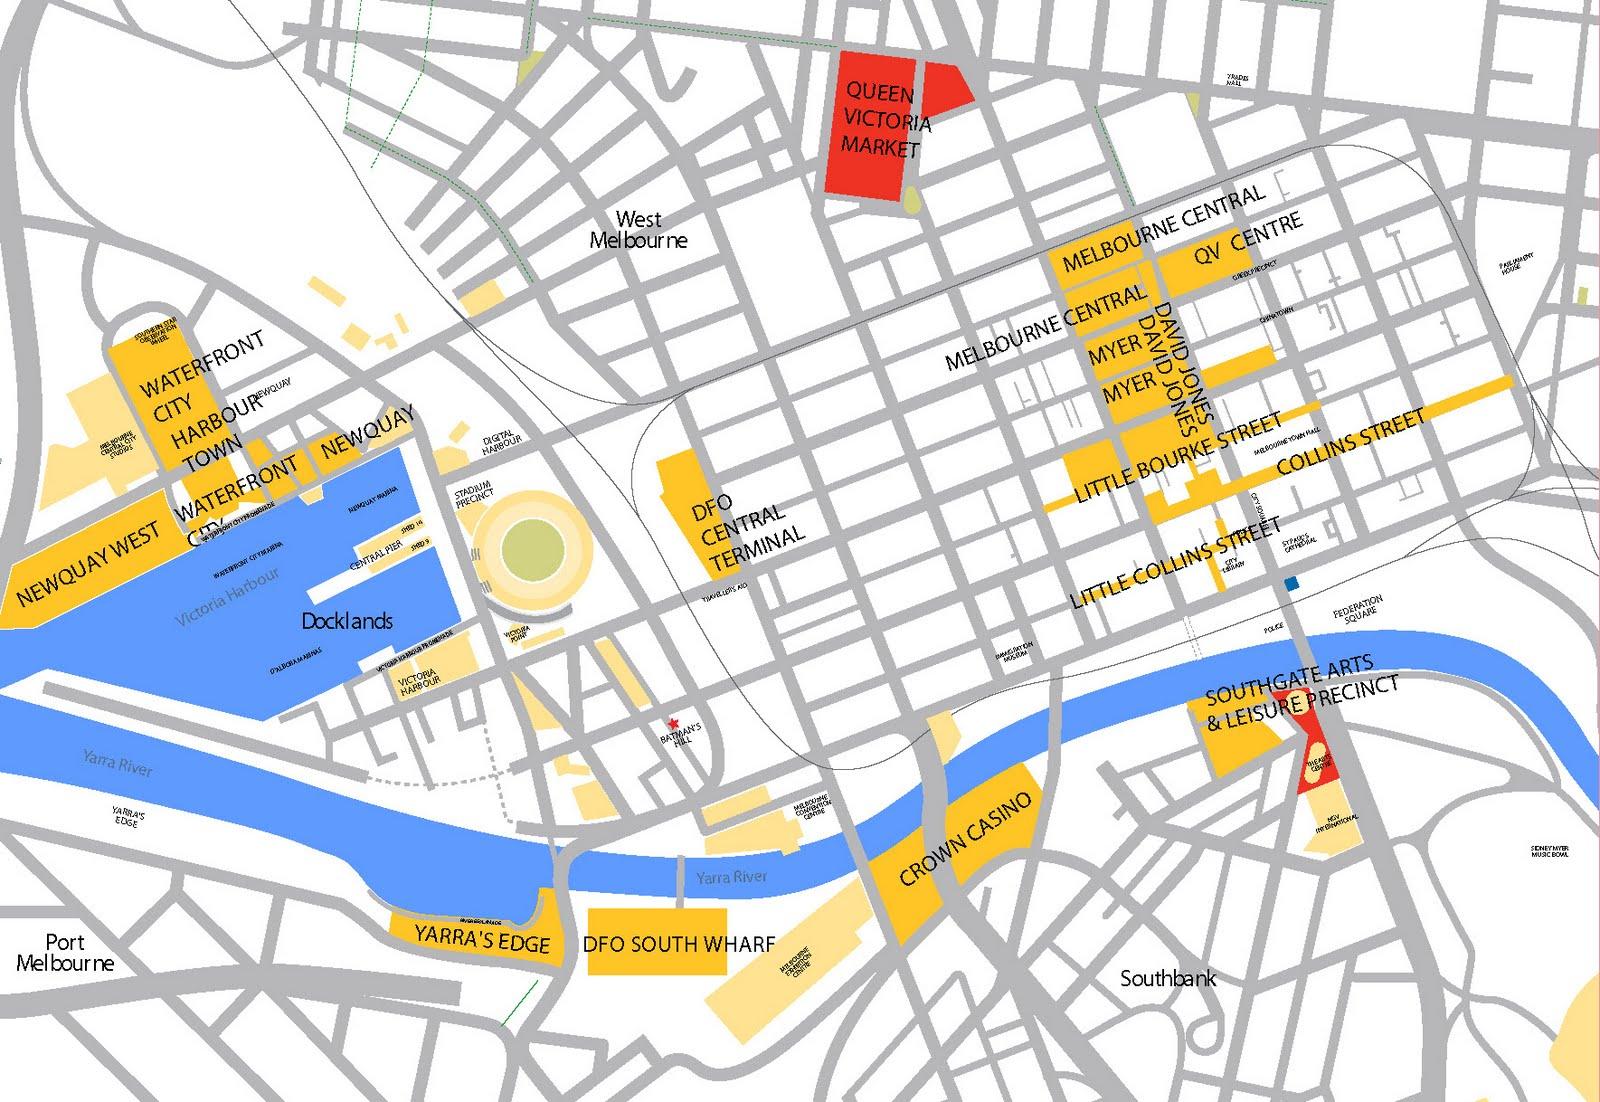 Melbourne Map Centre. Australia's No.1 map shop. Melbourne Map Centre, P.O. Box 55, Holmesglen, Victoria, Australia.